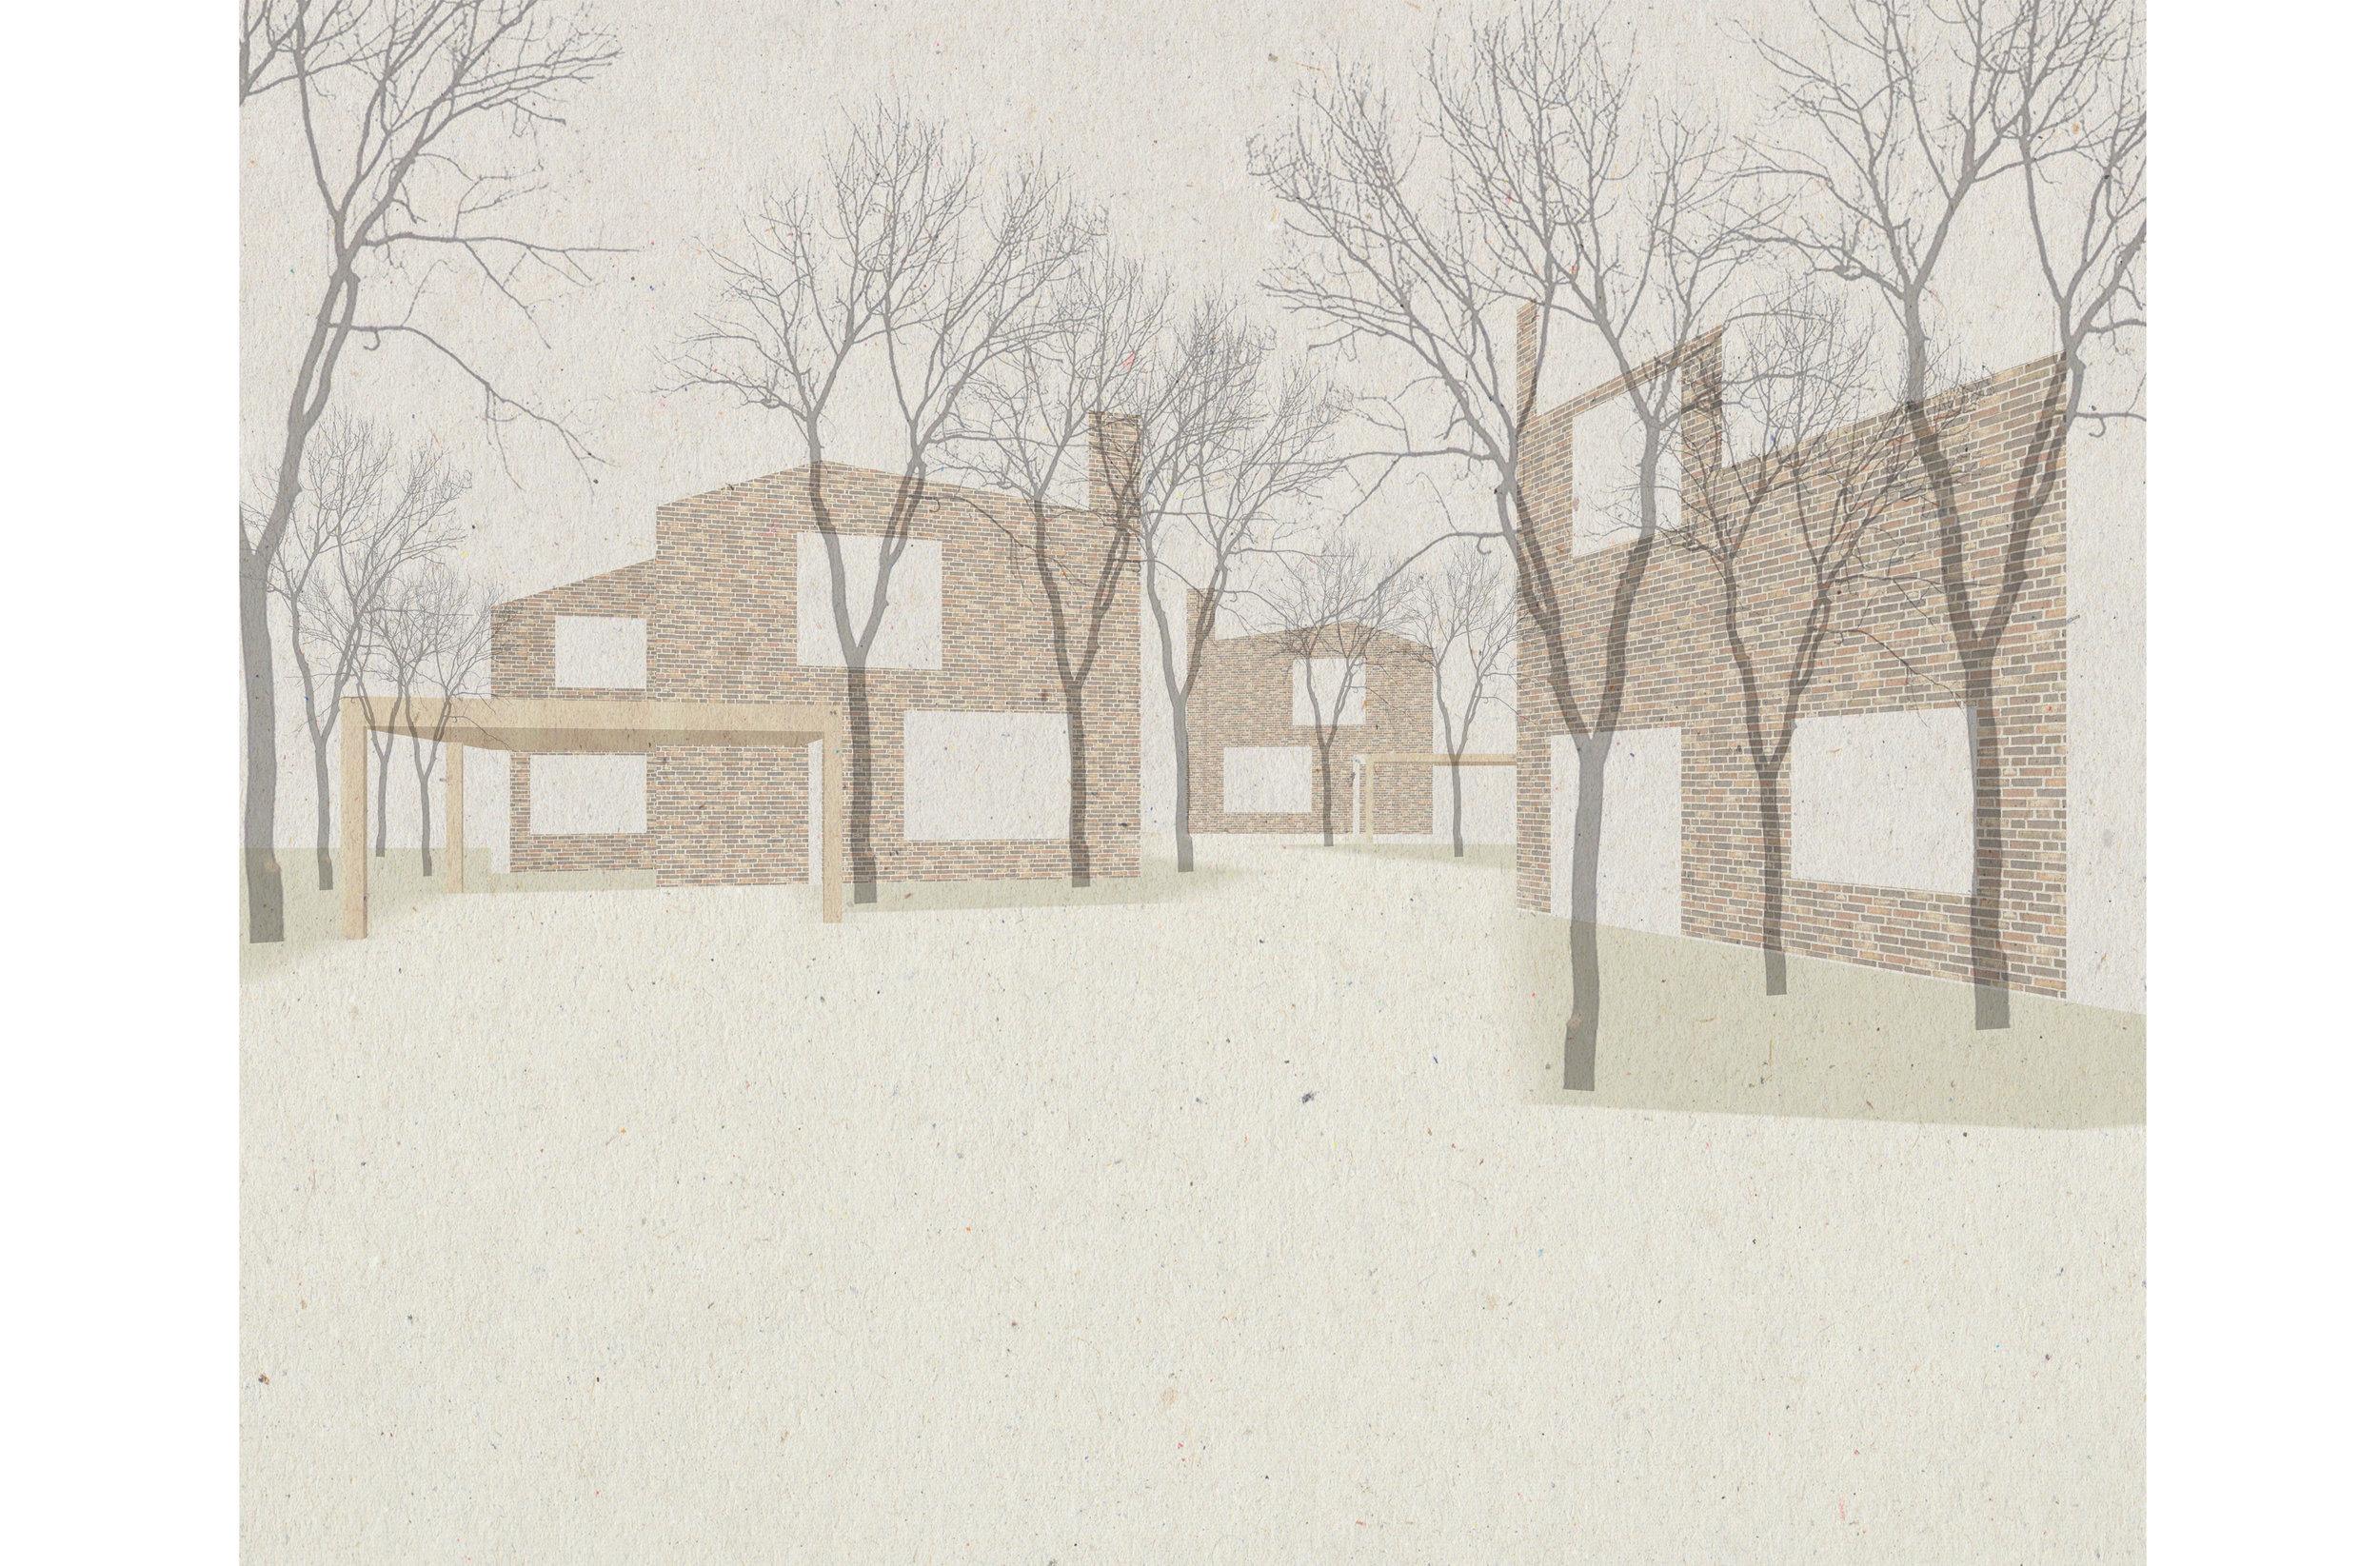 Fig 7. Suburban Villas, Aldershot, Hampshire. Sergison Bates architects